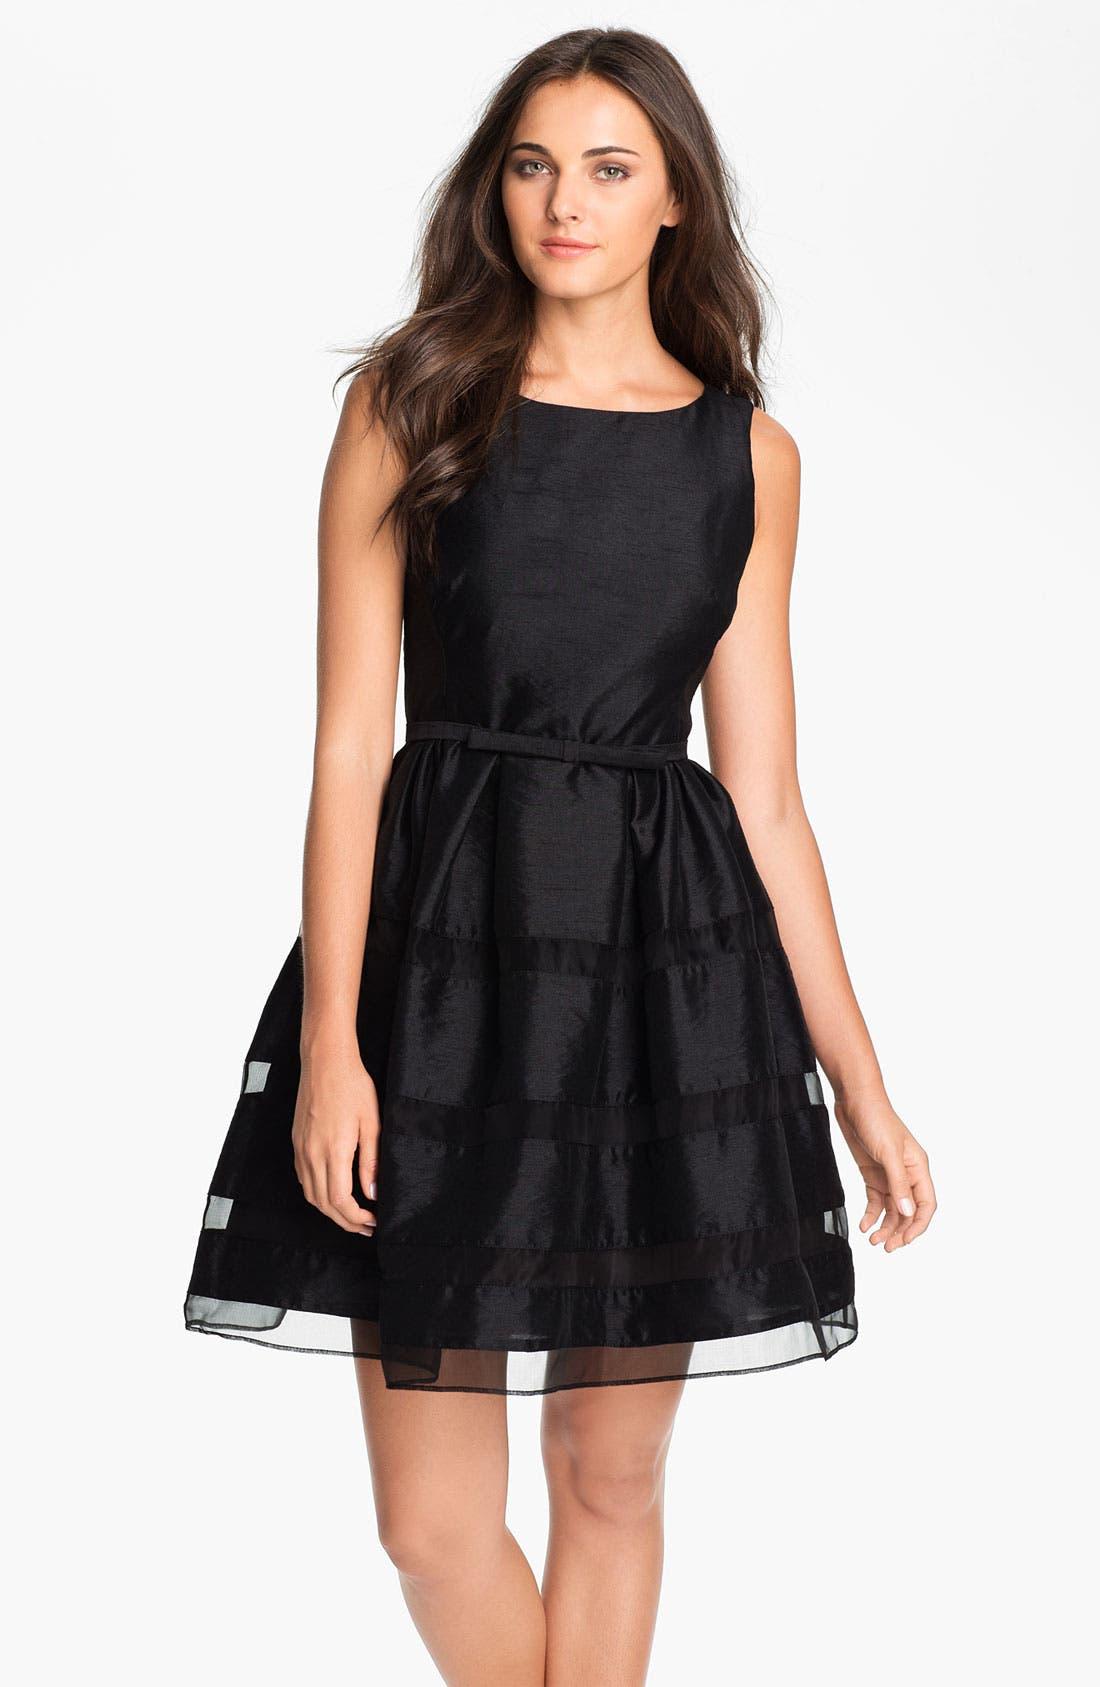 Alternate Image 1 Selected - Taylor Dresses Tonal Stripe Fit & Flare Dress (Regular & Petite)